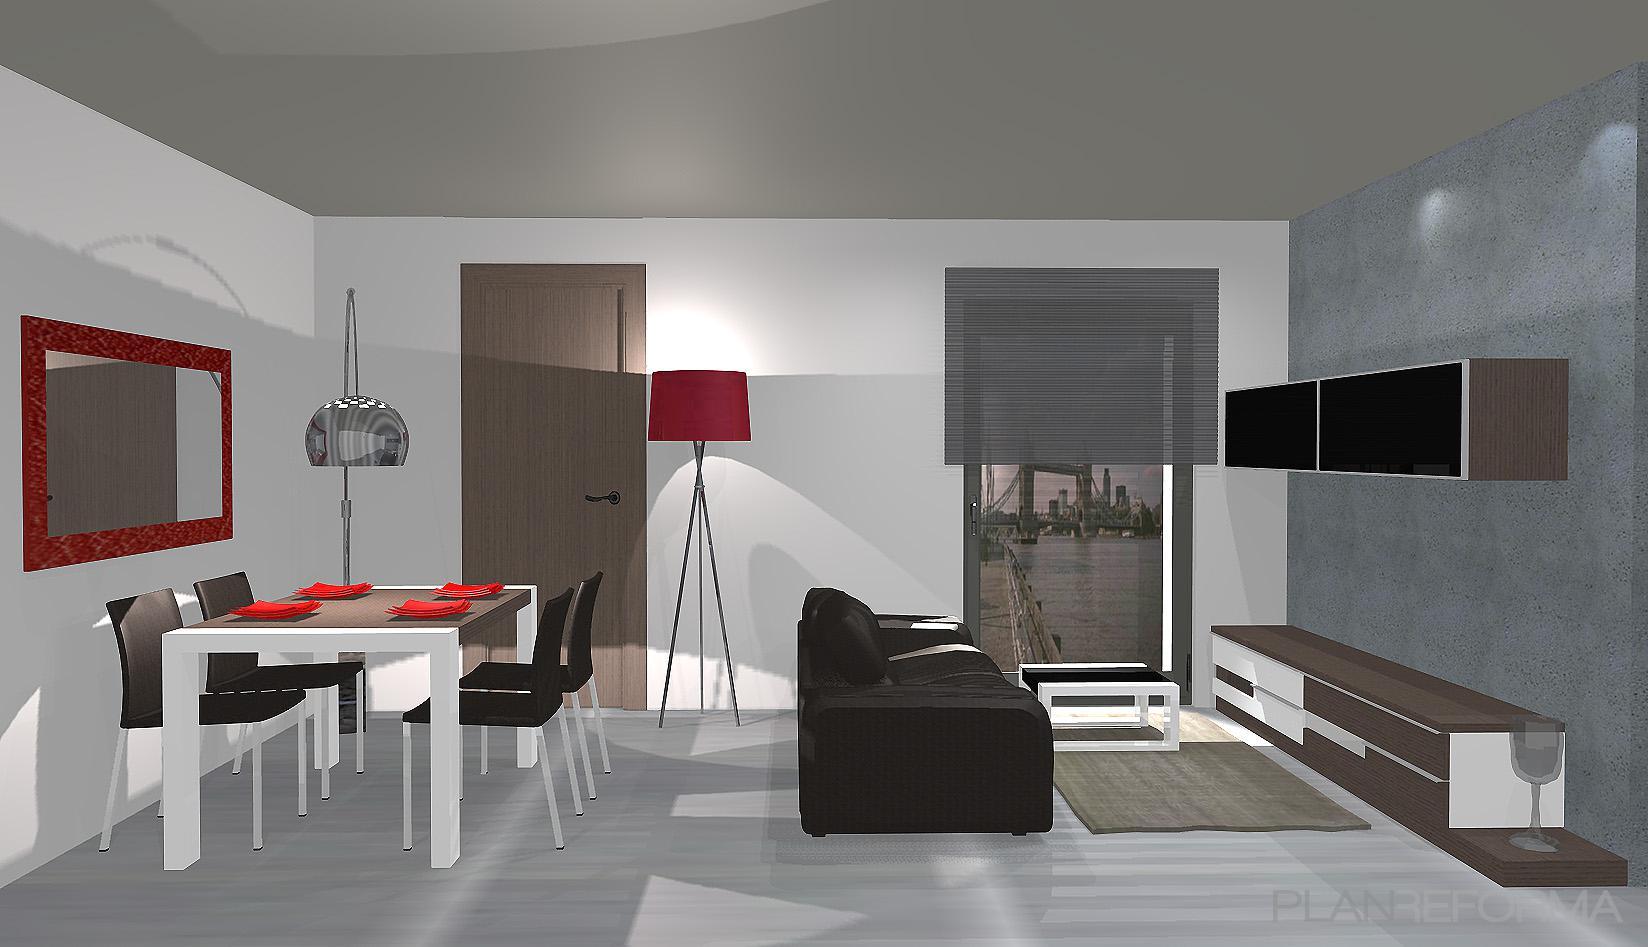 Comedor salon style contemporaneo color rojo gris negro for Comedor contemporaneo